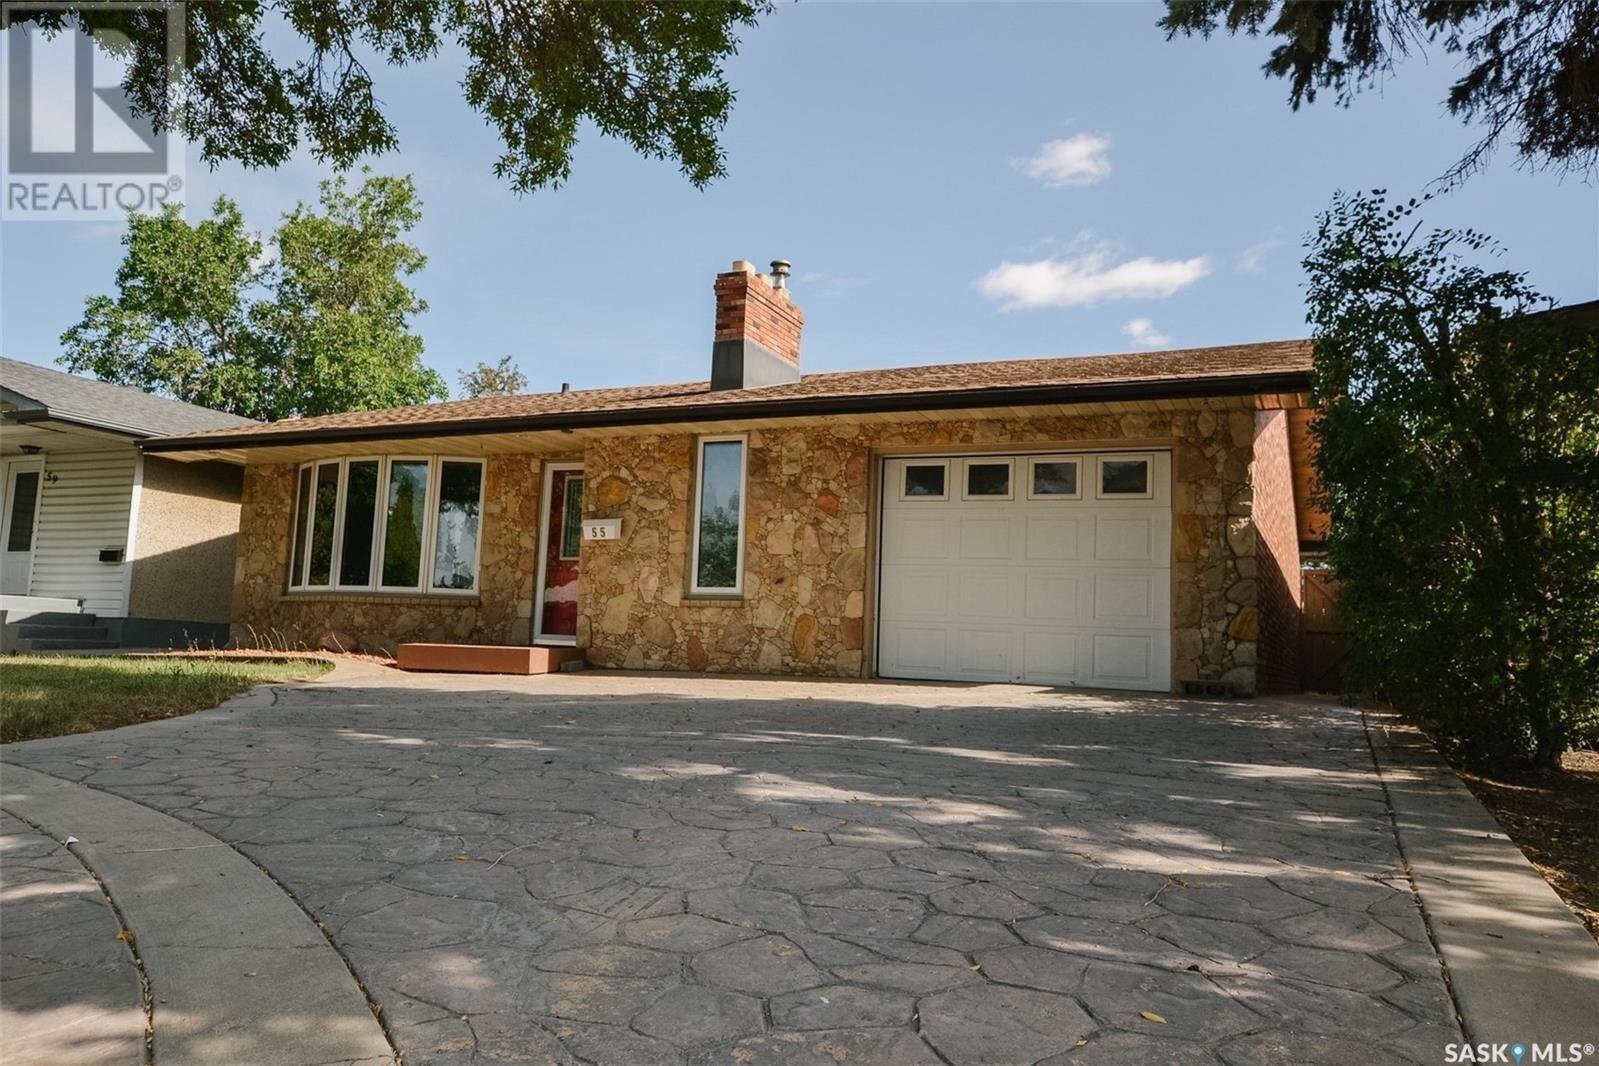 House for sale at 55 Rothwell Cres Regina Saskatchewan - MLS: SK834545